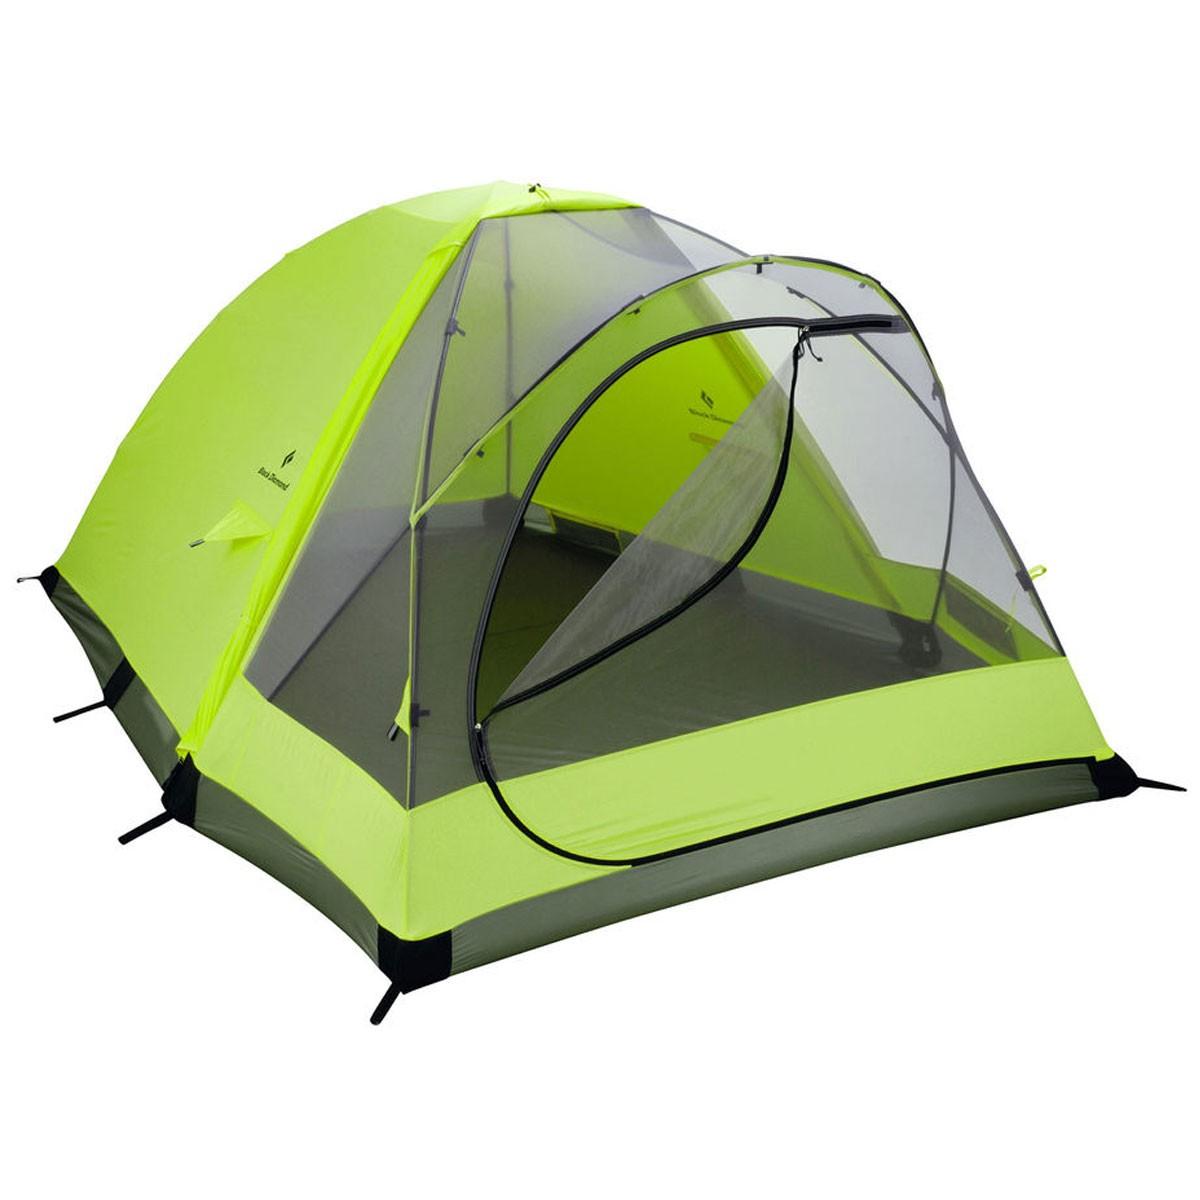 Lækker Black Diamond Skylight Tent Telt til 2-3 personer AJ-69